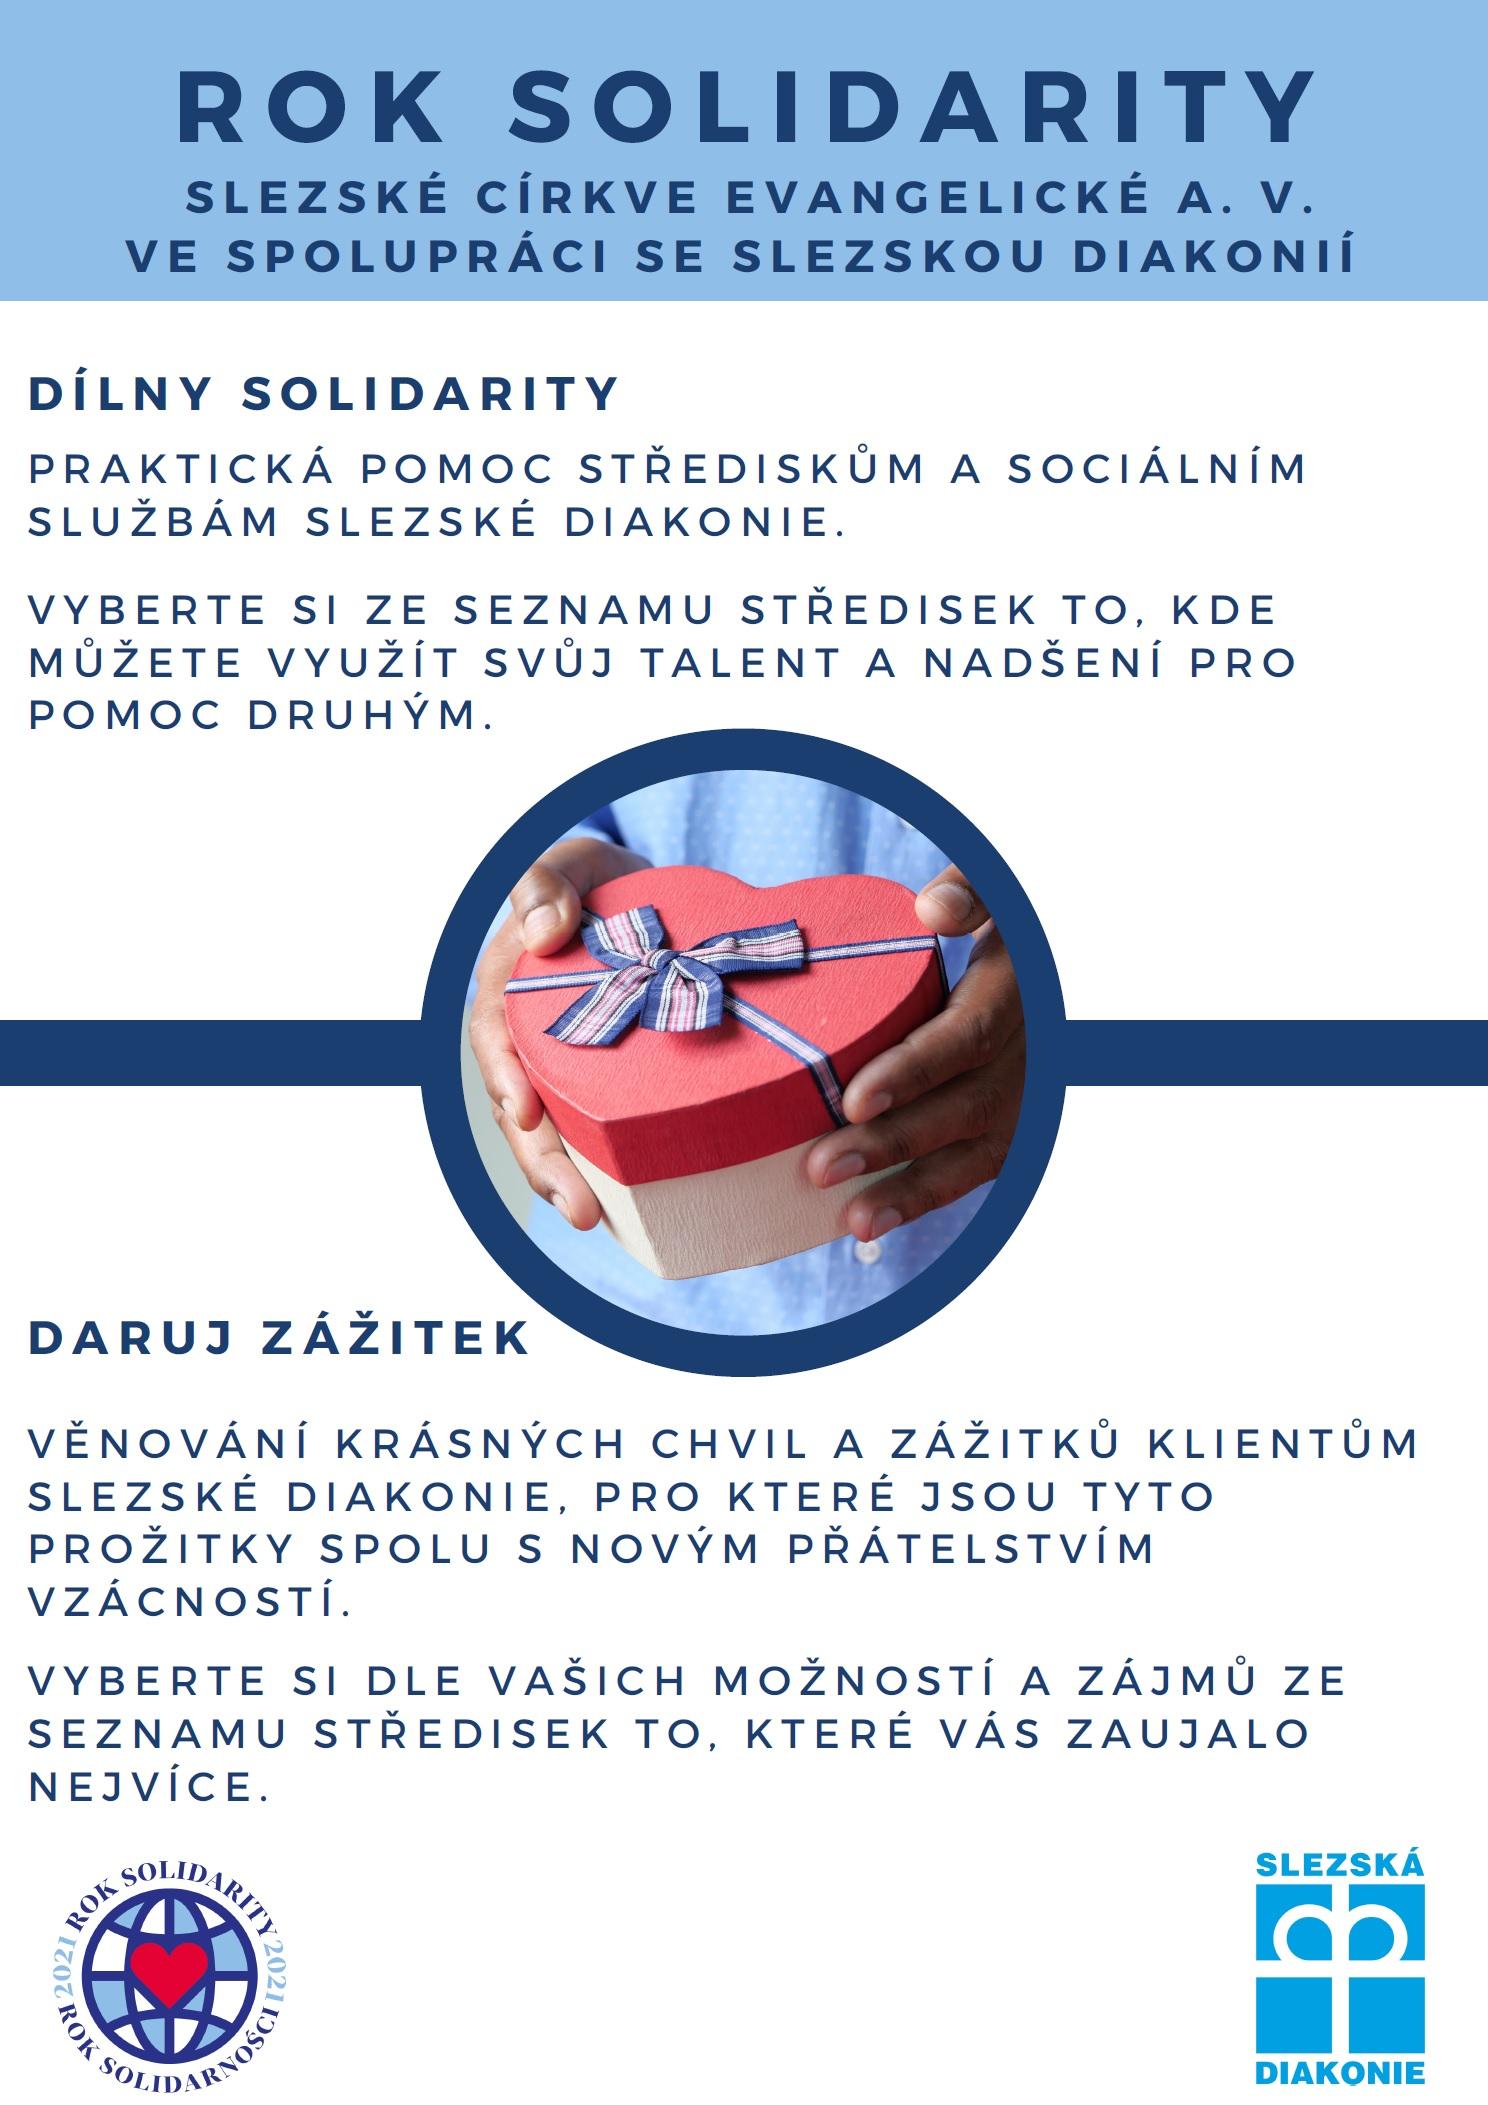 Praktické projekty v rámci Roku solidarity